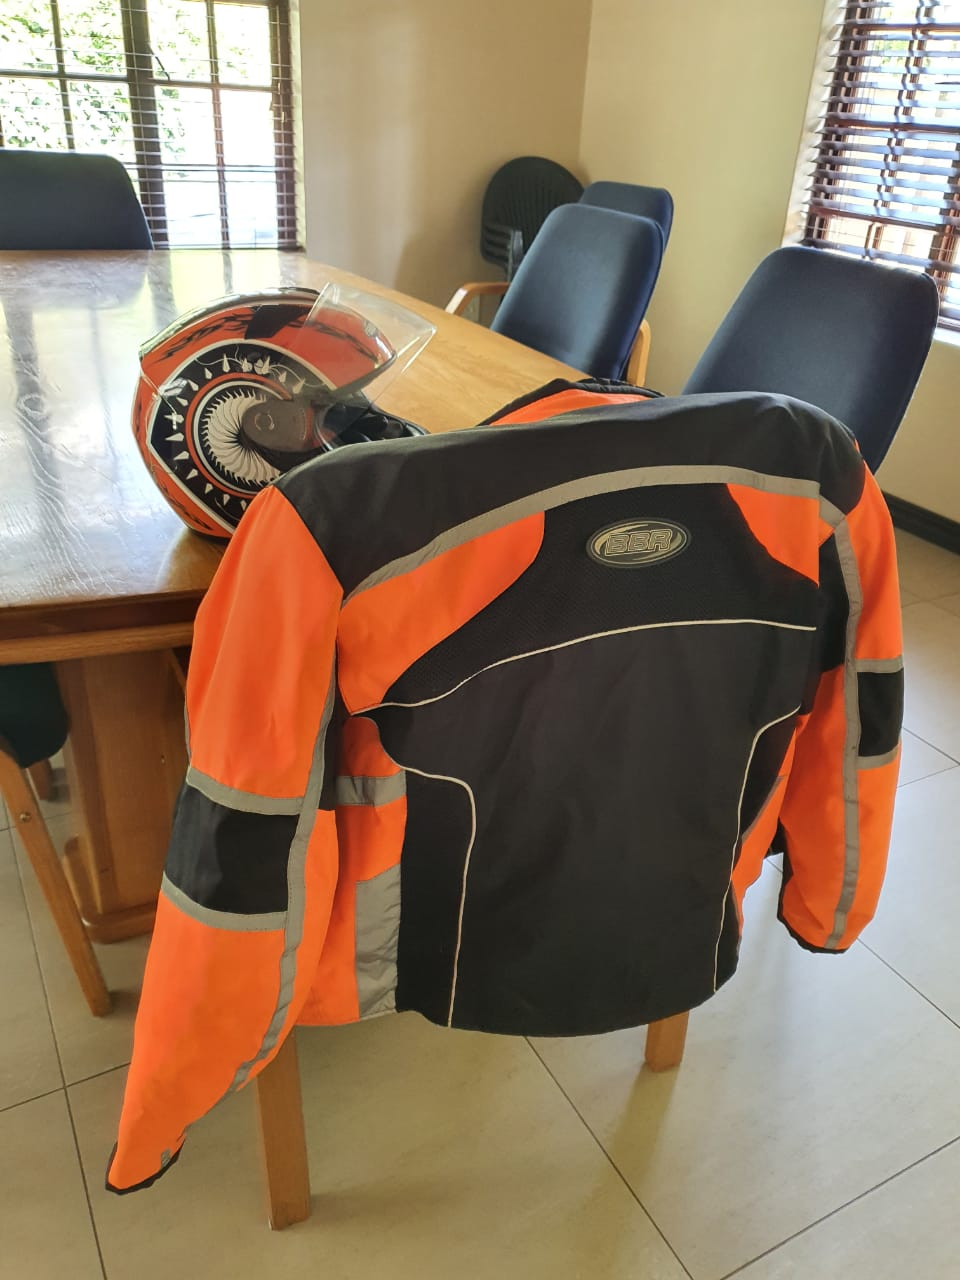 Second hand bike gear